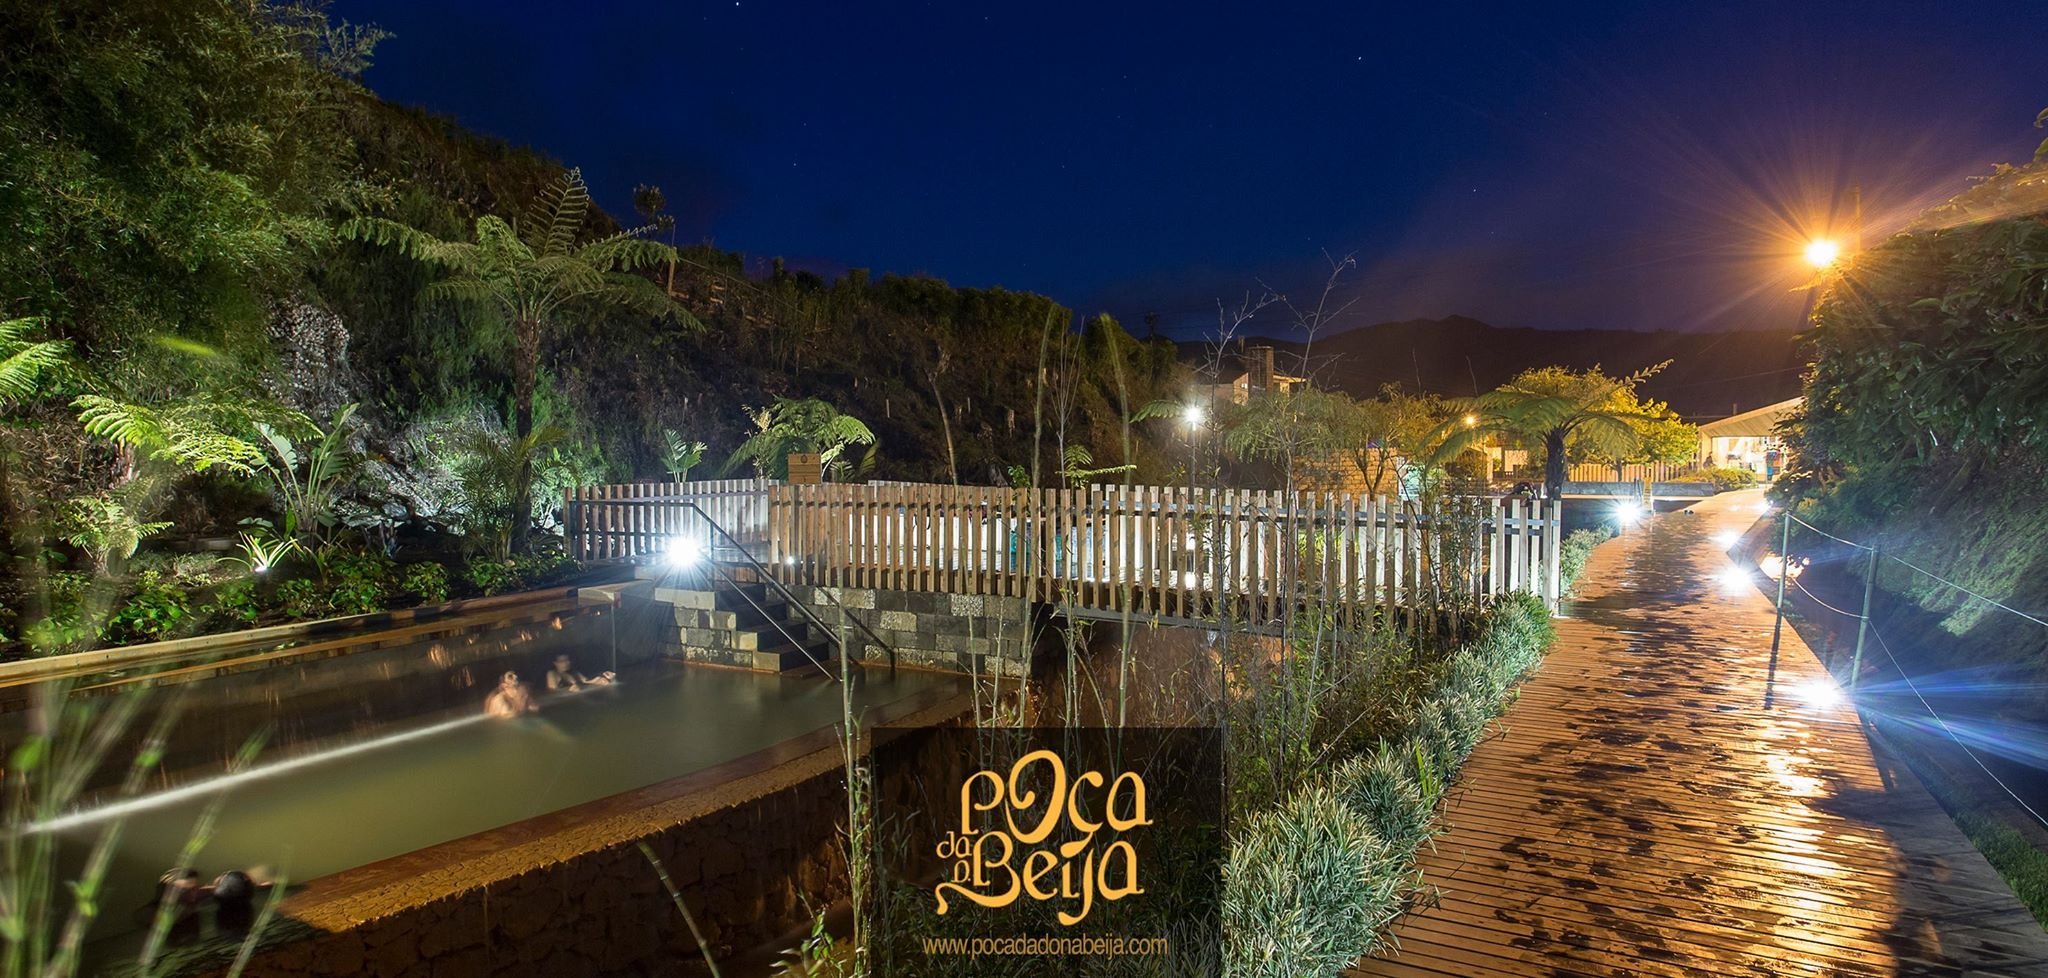 Night time at Poça da Dona Beija #azores #poçadonabeija #thermal #night #pools #piscinastermais #portugal #furnas